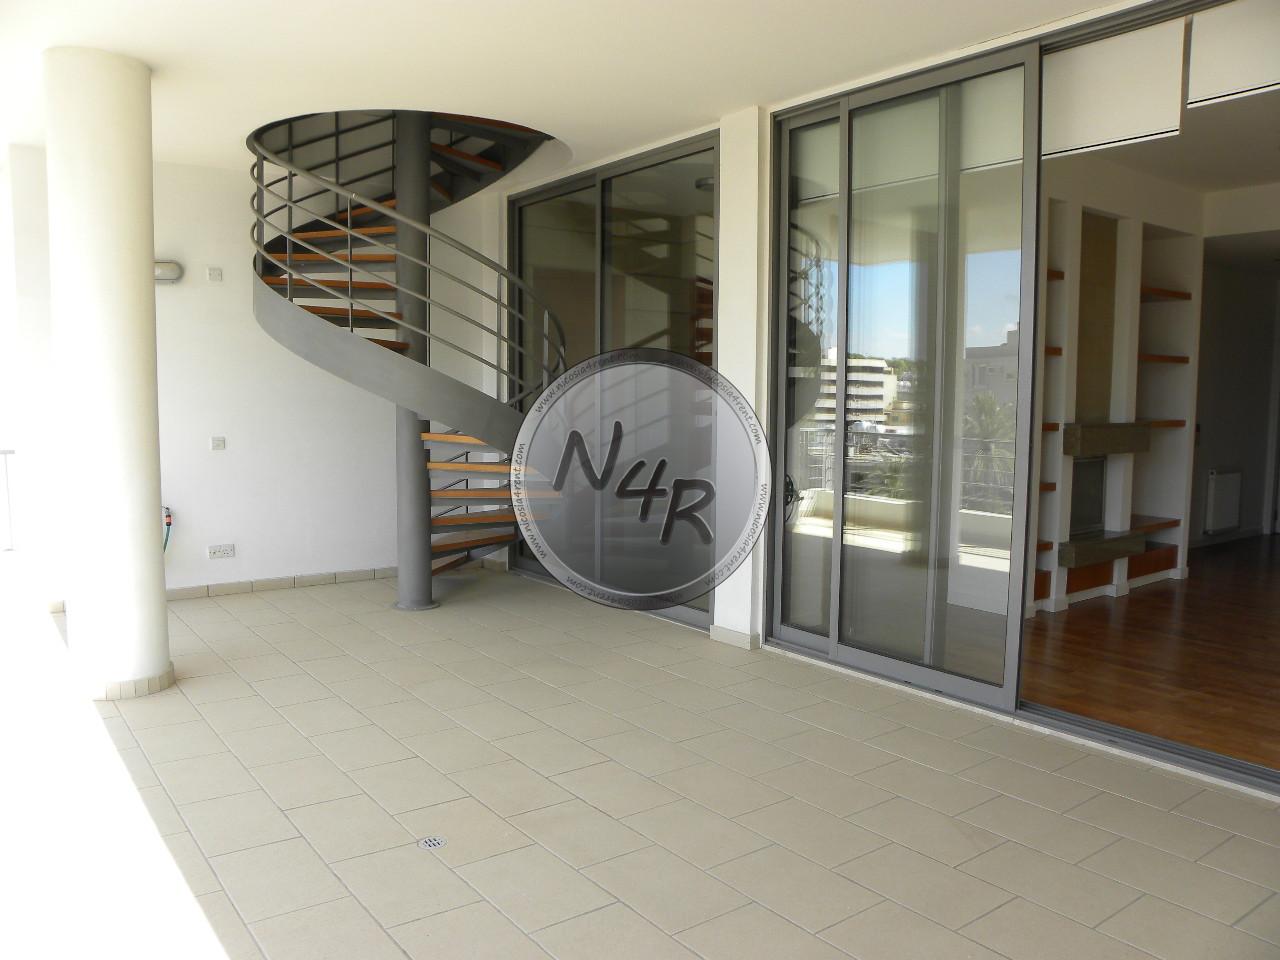 Luxury 4 Bedroom Flat For Rent In Acropolis, Nicosia